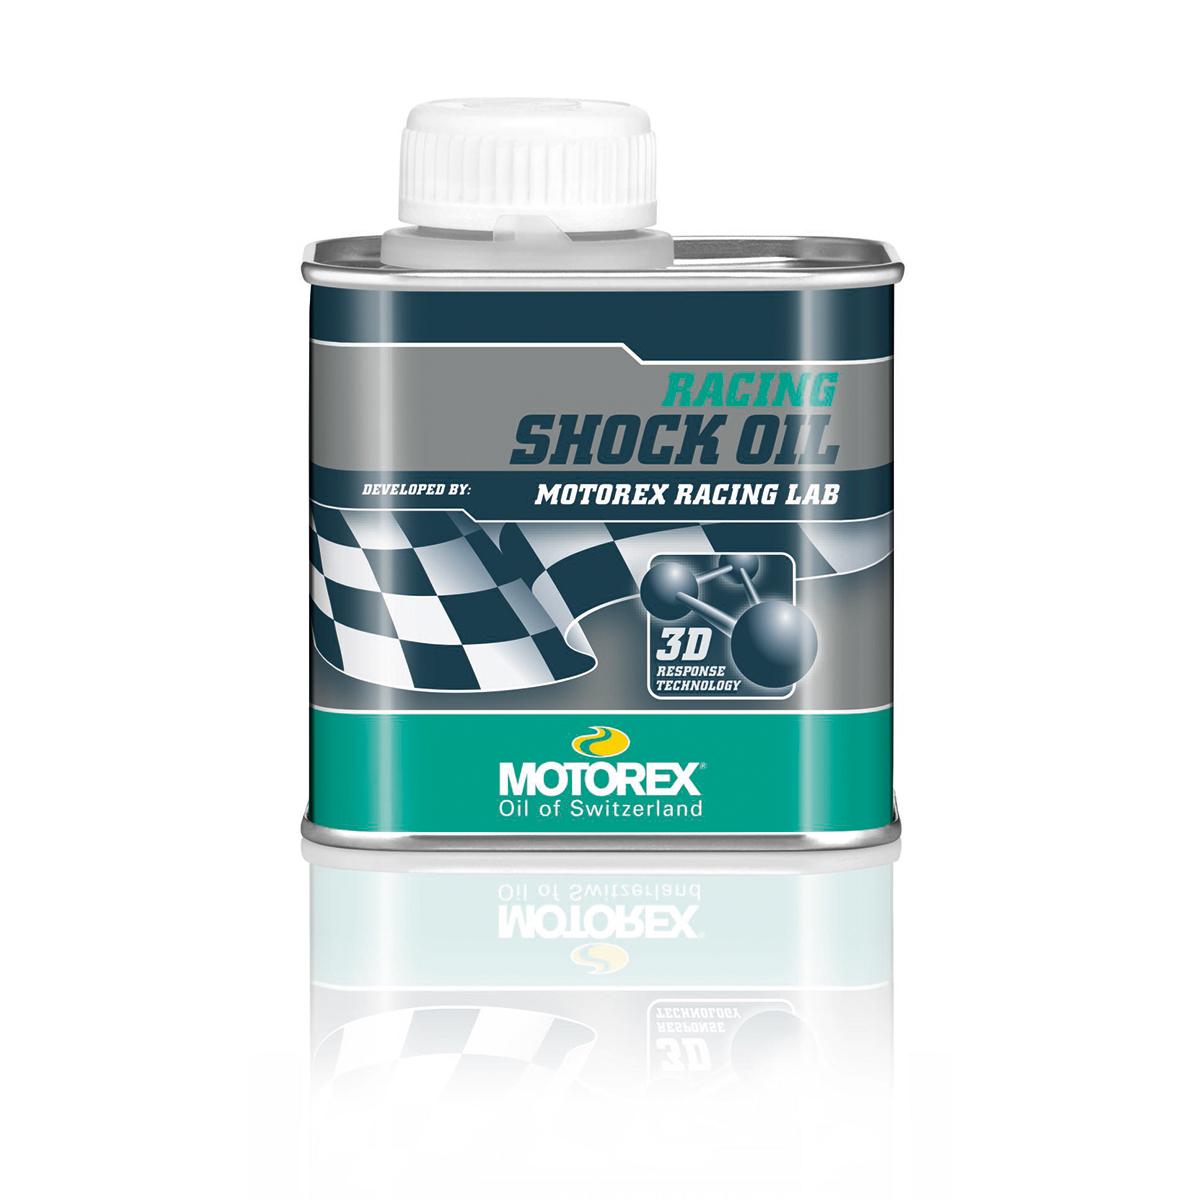 20200827_RACING_SHOCK_OIL_250ml